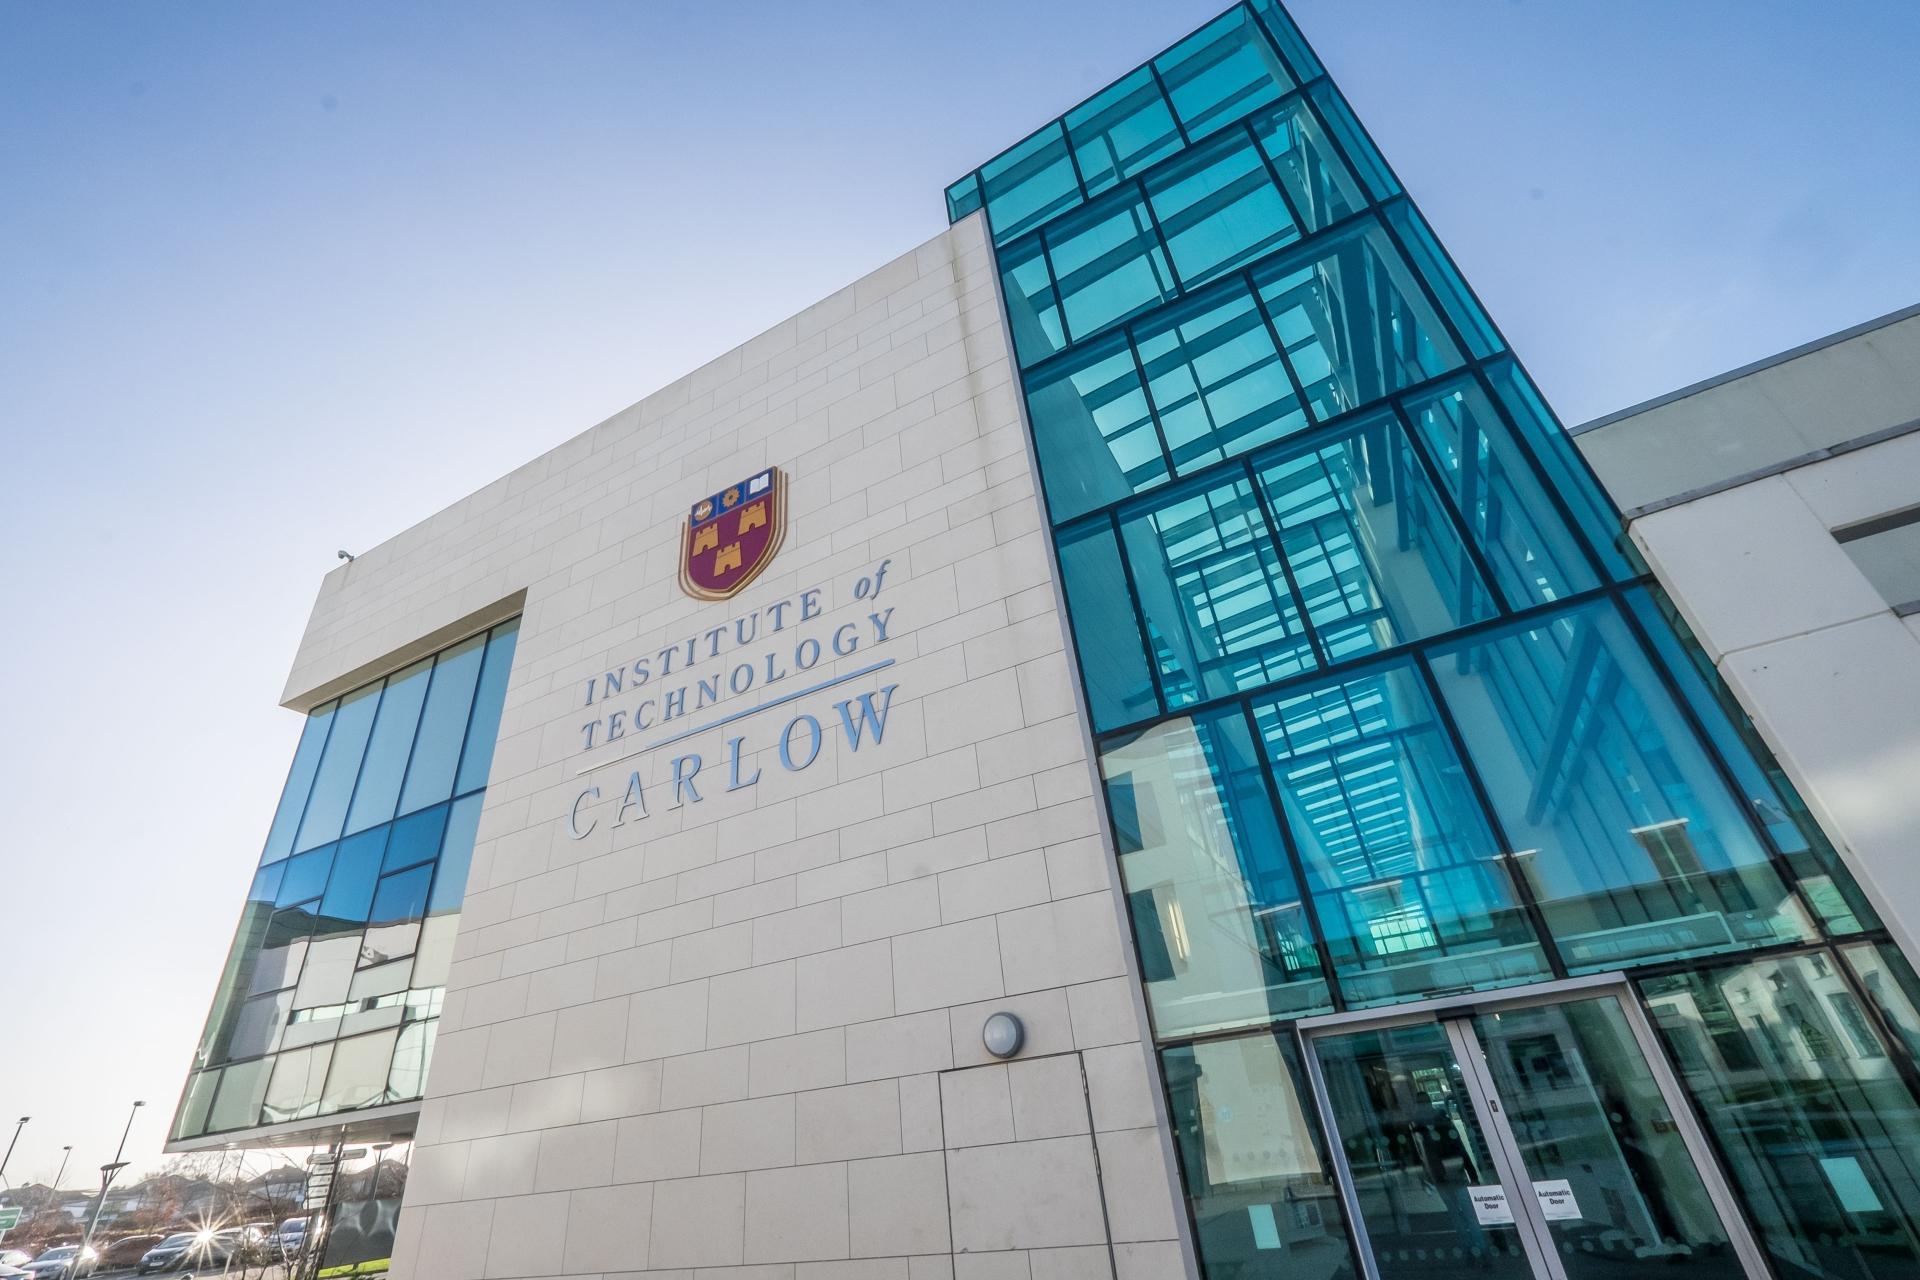 Beasiswa Program S1, S2, S3 GOI-IES Pemerintah Irlandia, Deadline 26 Maret 2021